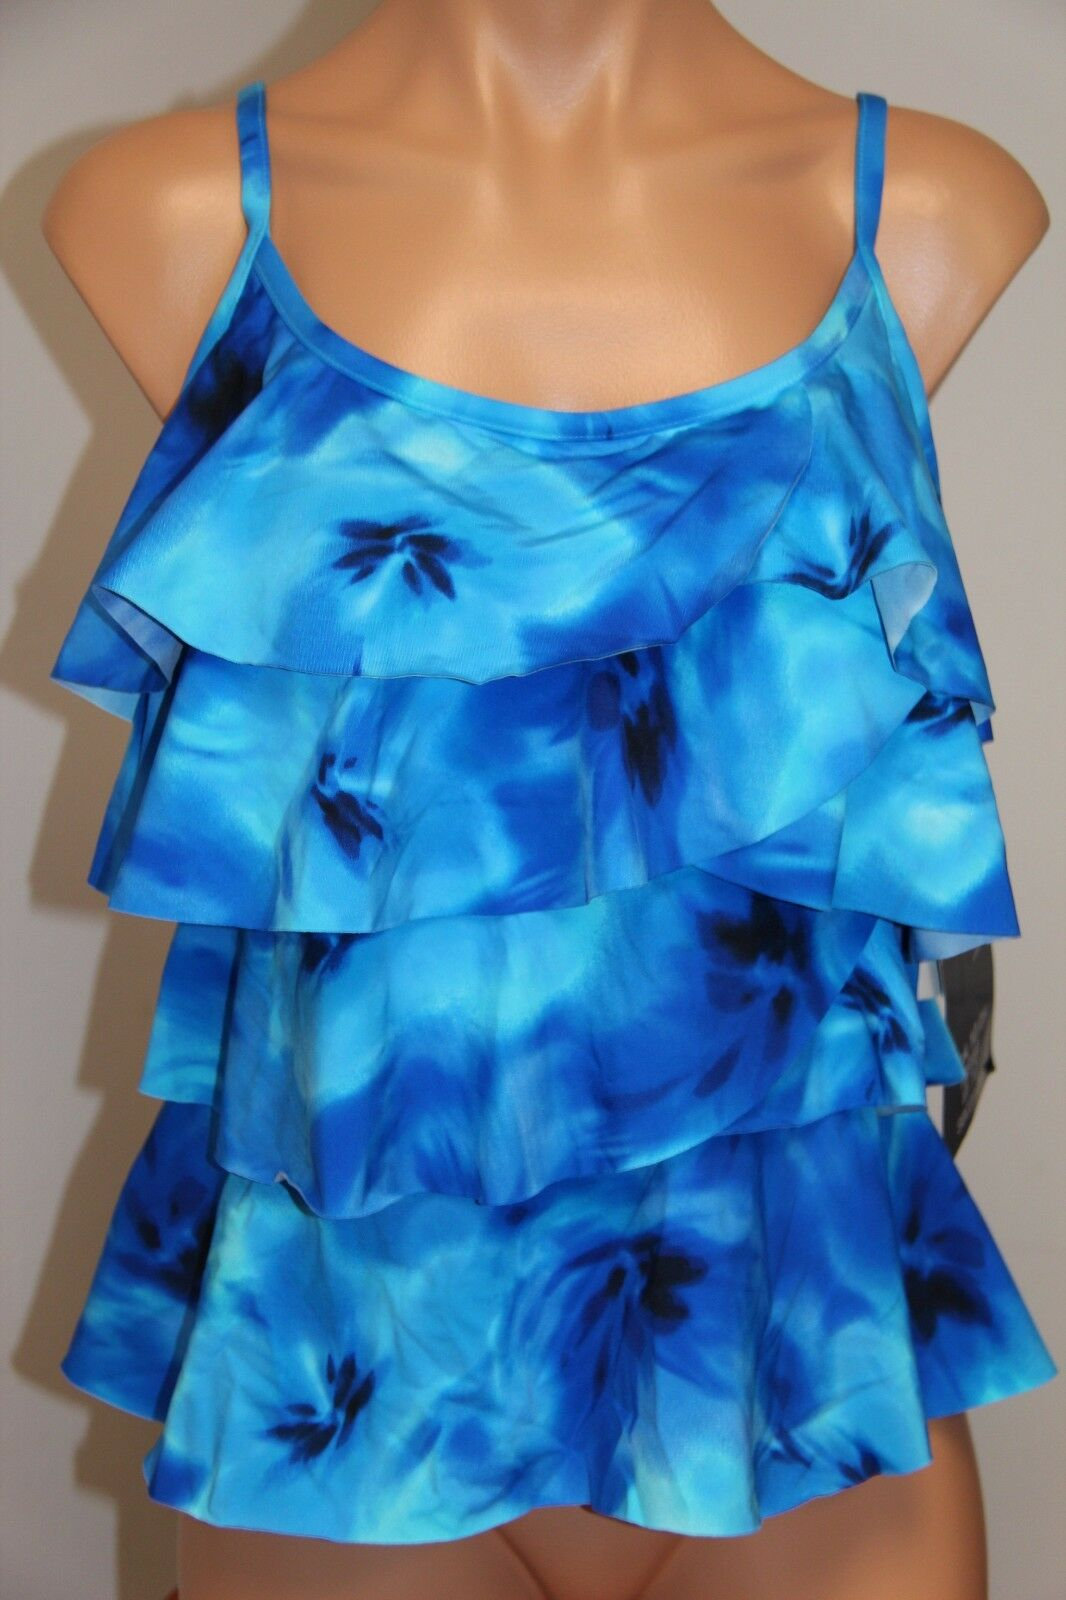 New  Miraclesuit Swimsuit Swimsuit Swimsuit Bikini Tankini Top sz 8 Ocean Dream Tiering UP fa3bf9